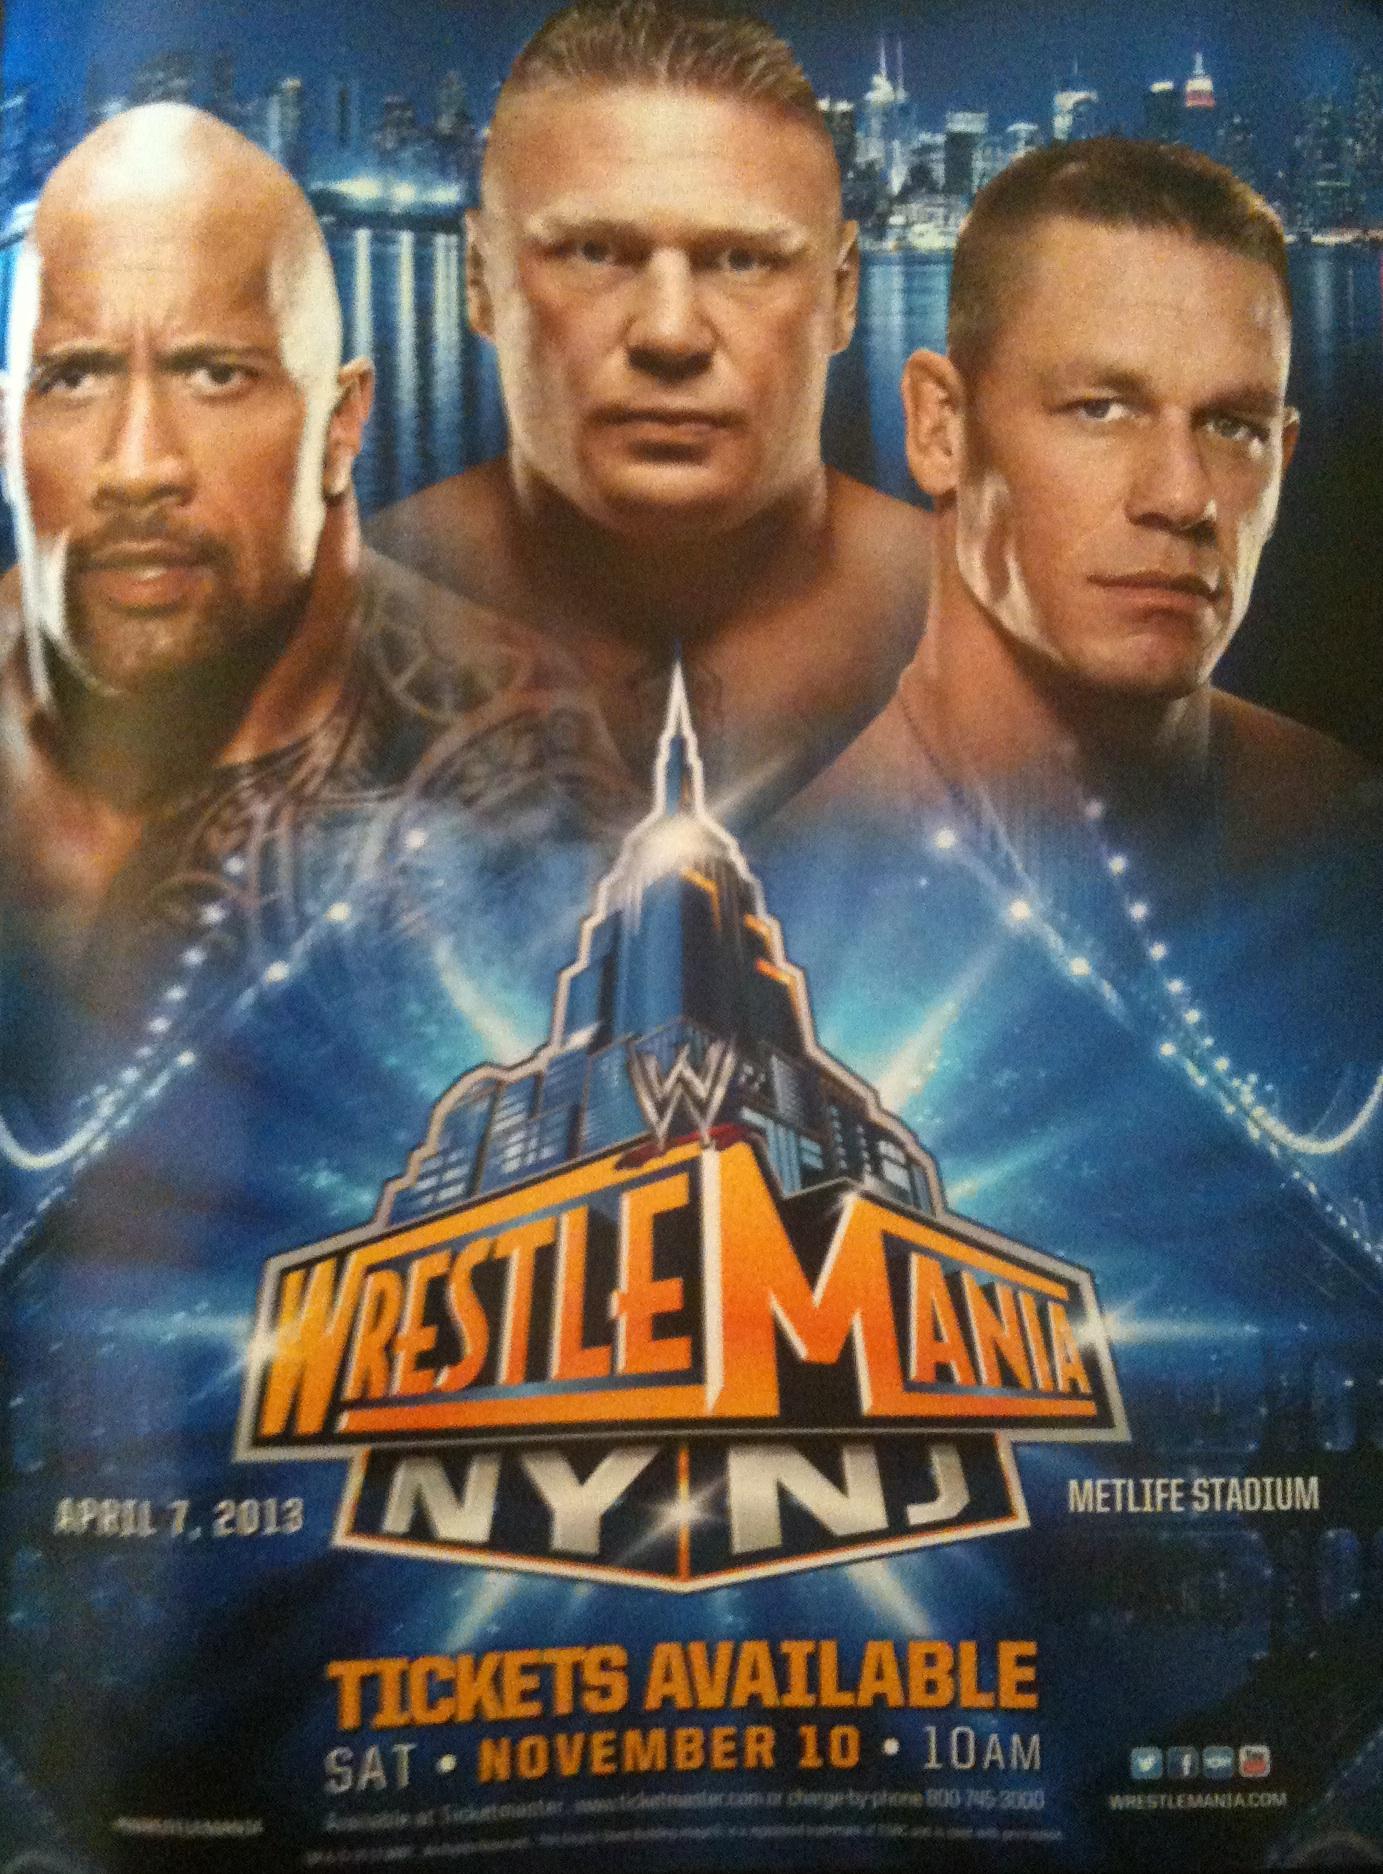 John Cena Wwe Champion 2013 Champ Is Here